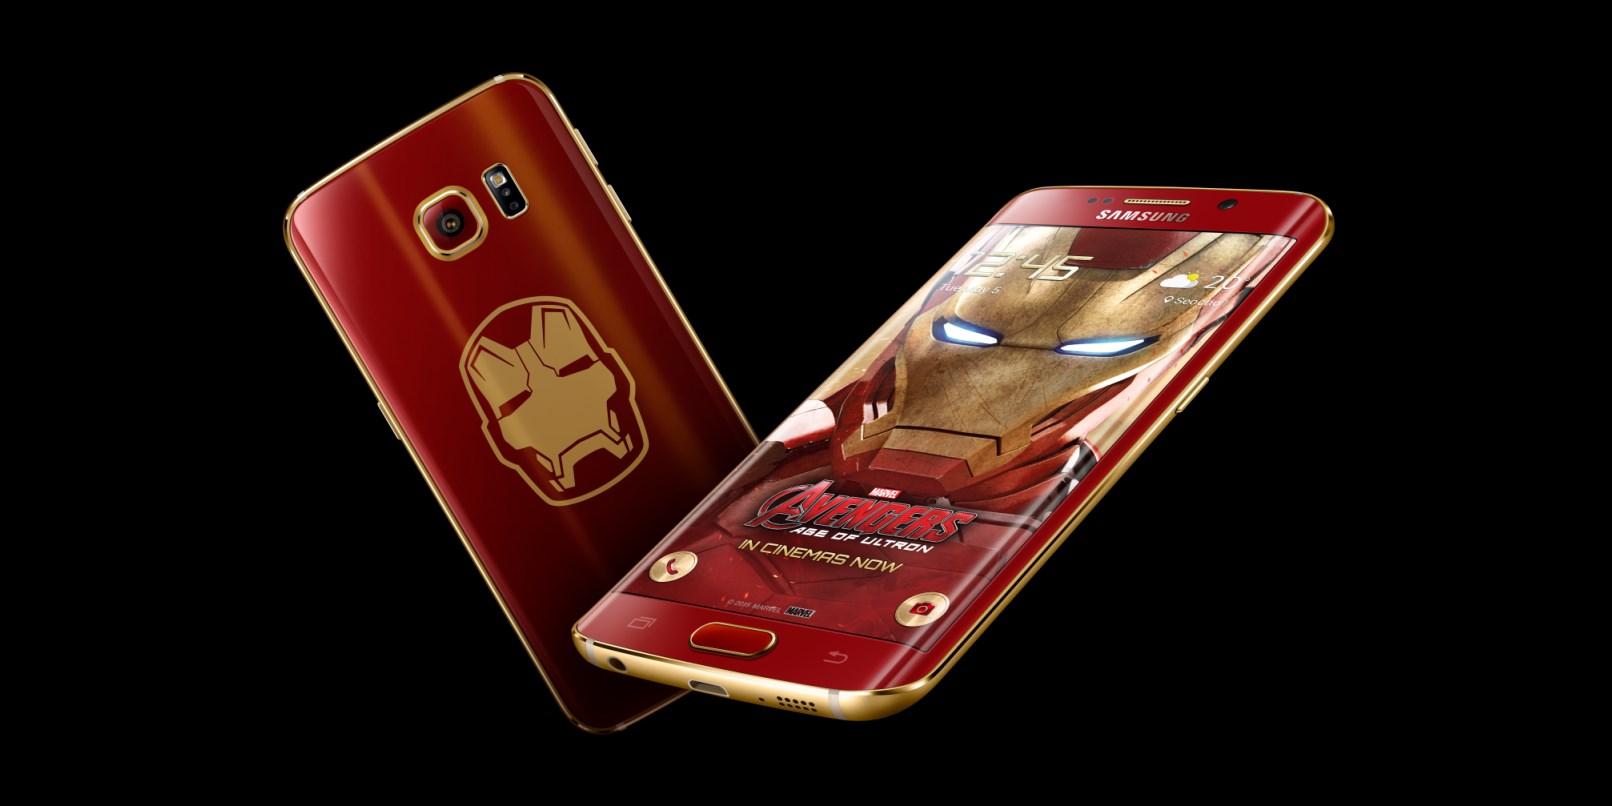 Marvel at Samsung's Galaxy S6 Edge Iron Man Limited Edition phone